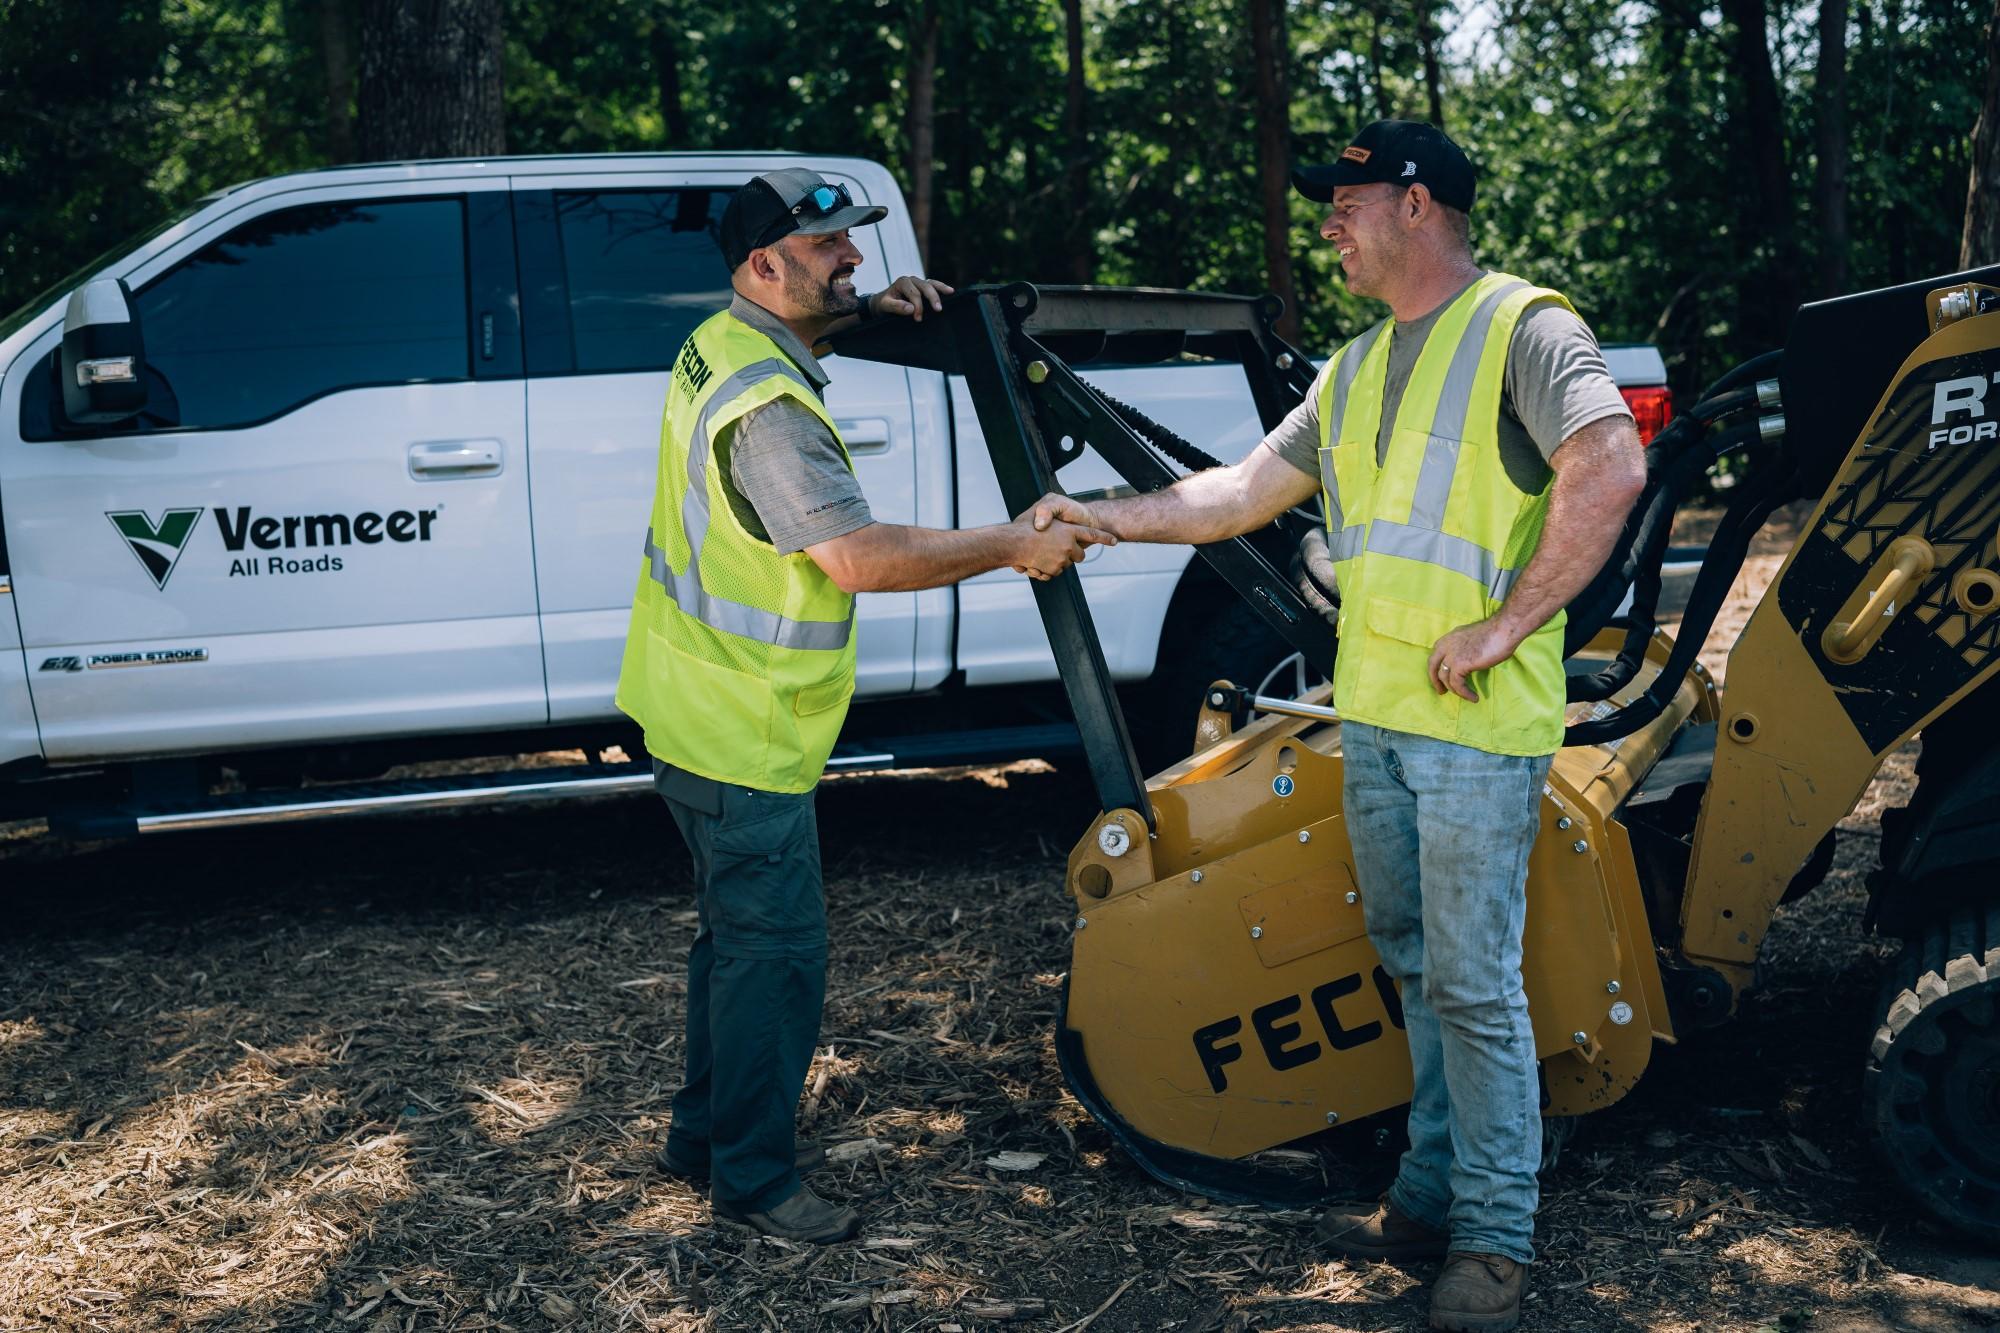 Fecon Equipment Sales Rep Visit with Vermeer All Rads Truck